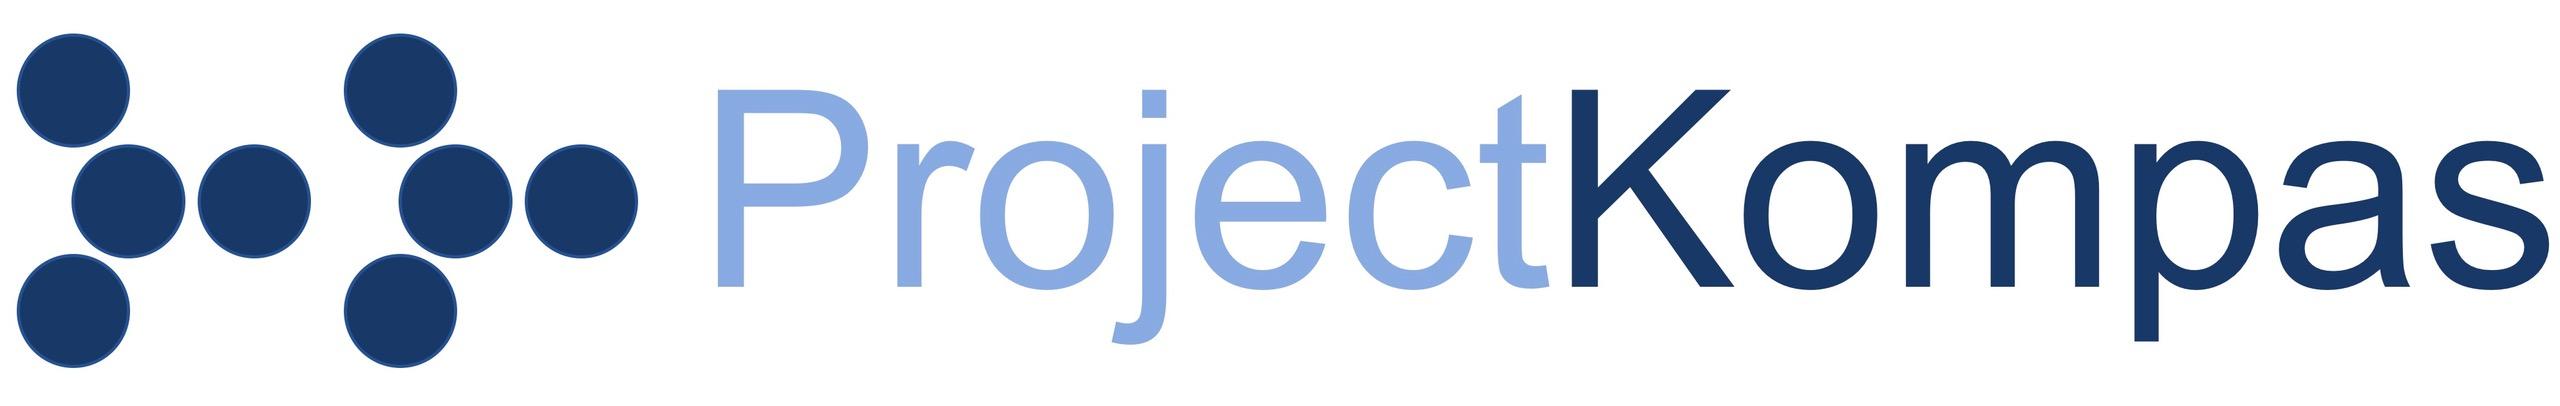 Project Kompas